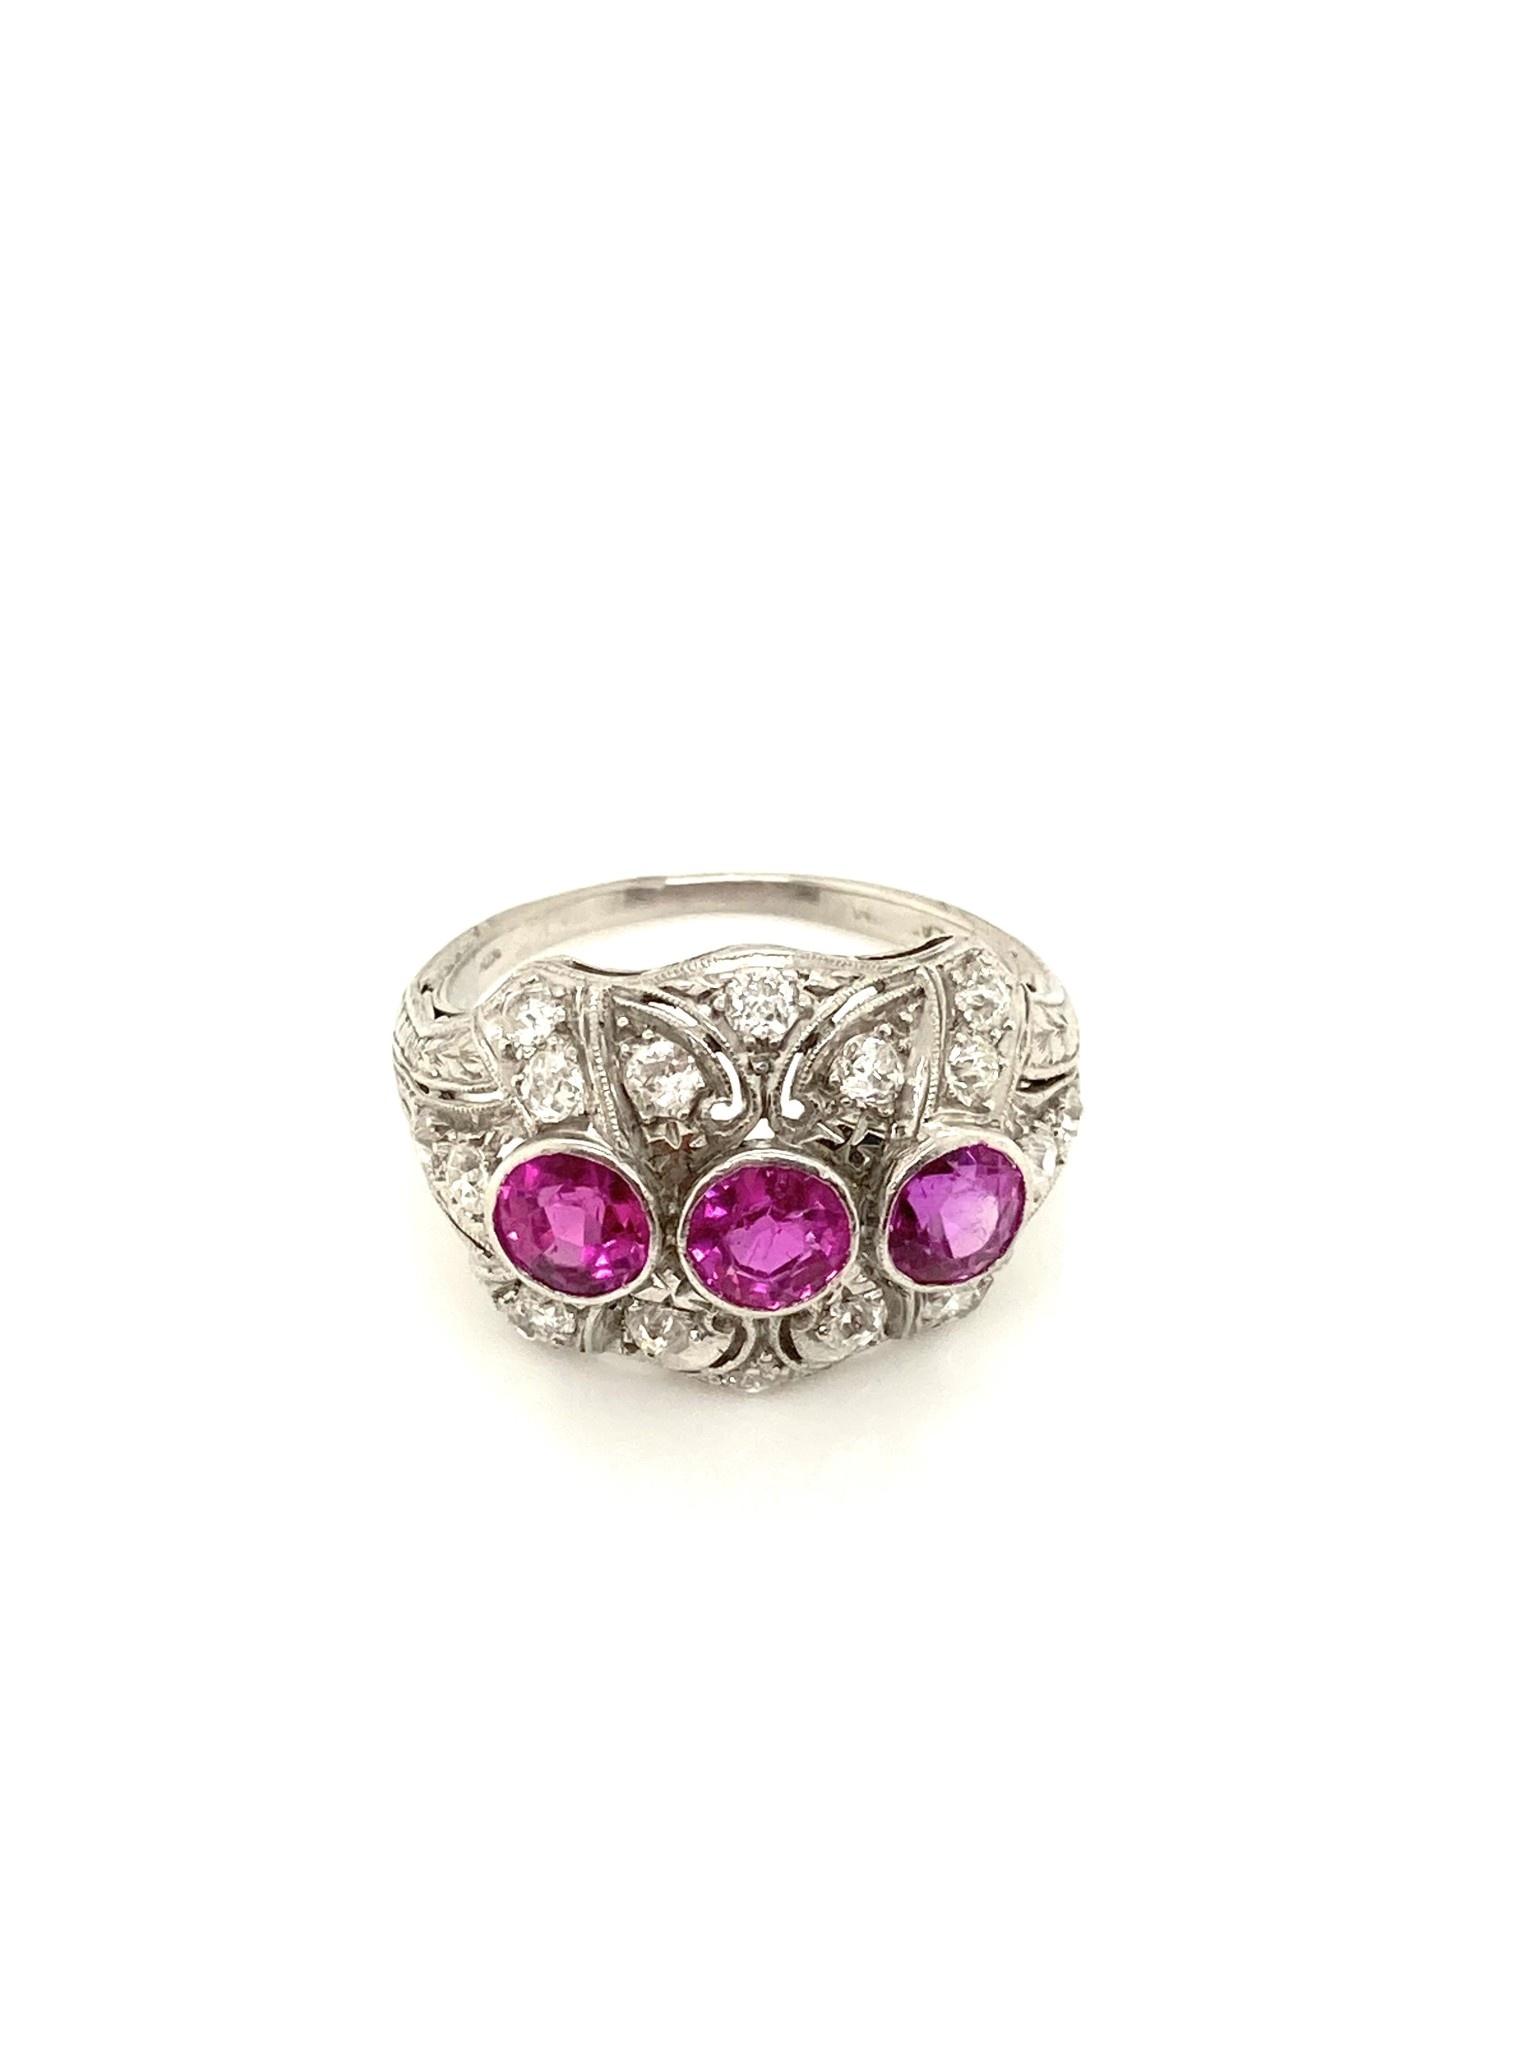 Platinum Diamond and Pink Sapphire Cocktail Ring